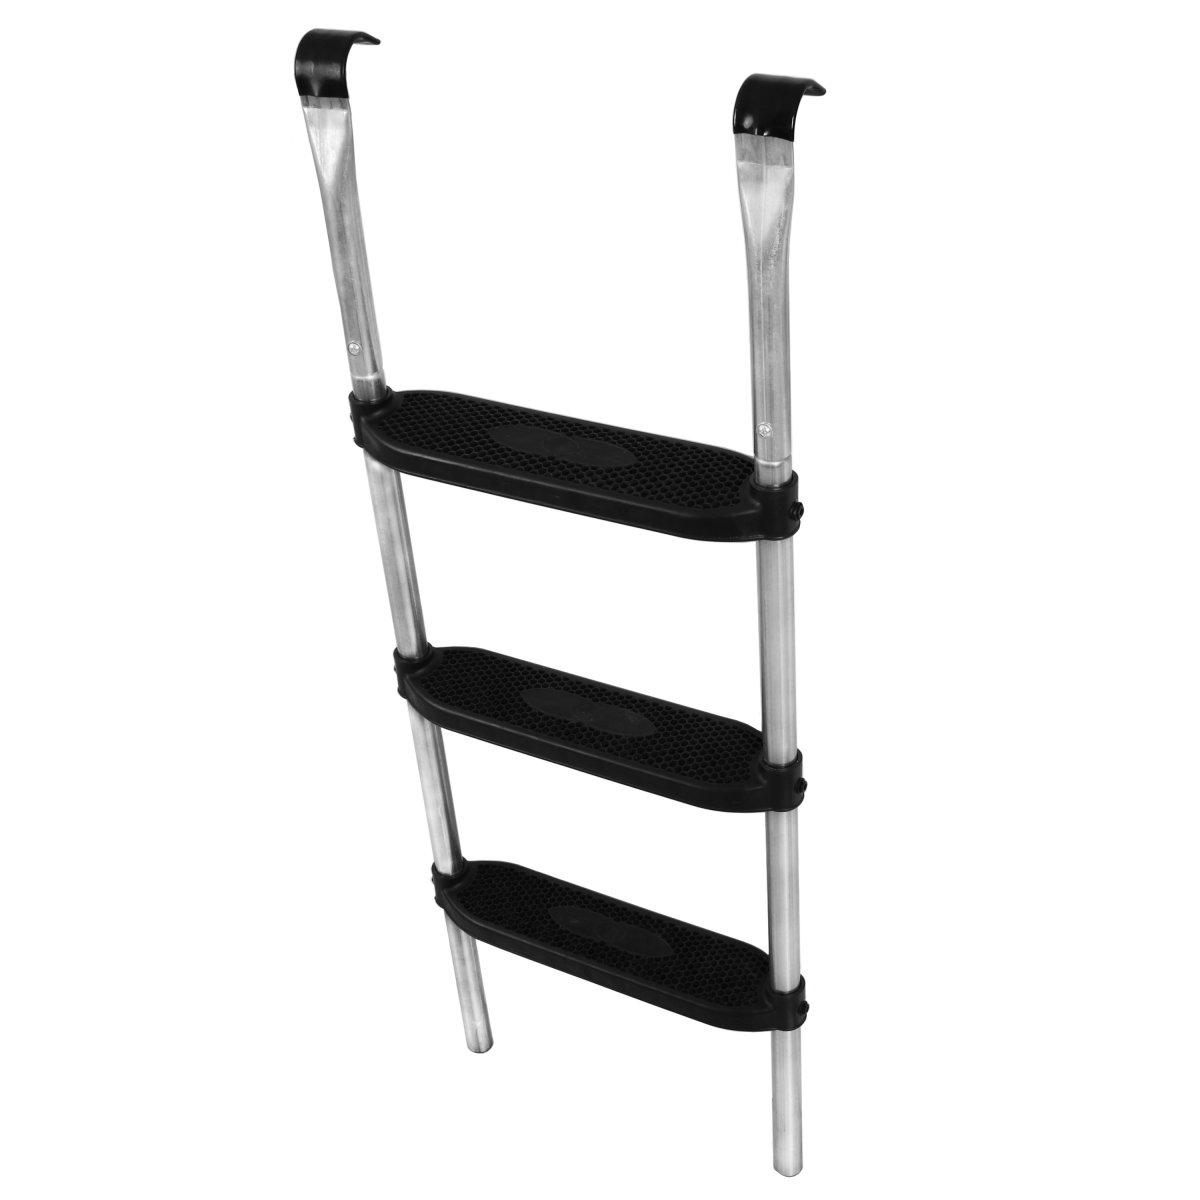 trampolin leiter 3 breite stufen. Black Bedroom Furniture Sets. Home Design Ideas